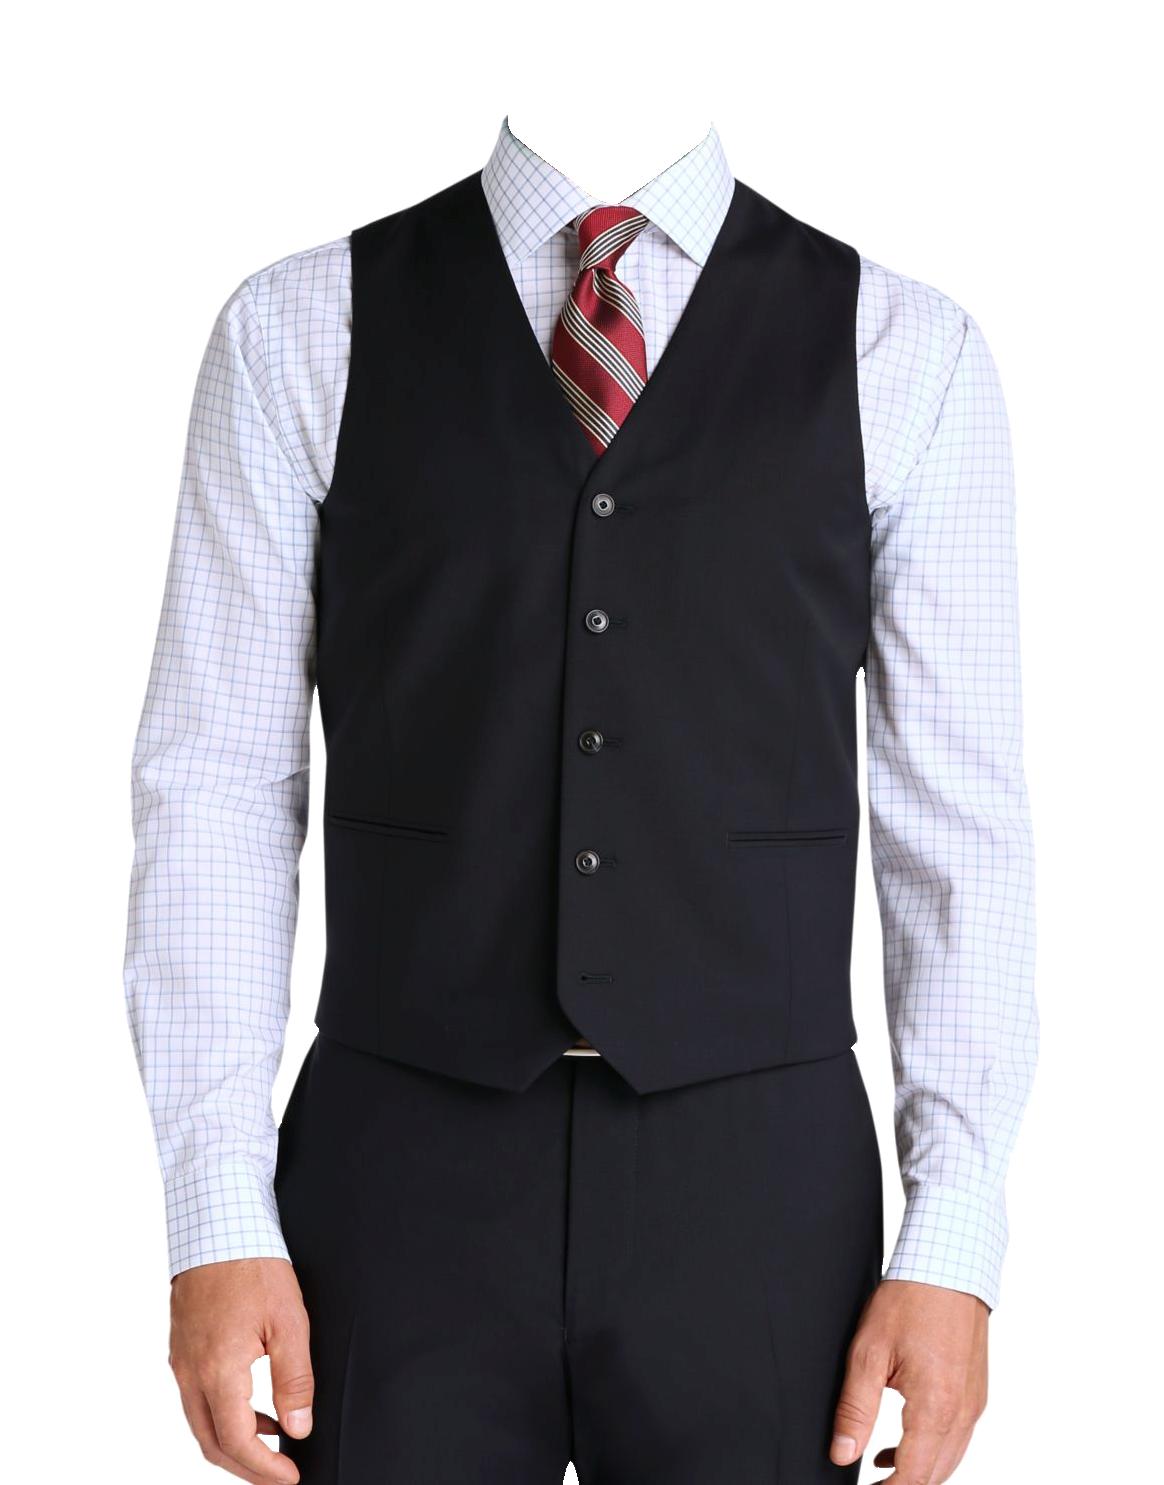 Men Suit PNG Image Photo editor for mac, Mens suits, Psd